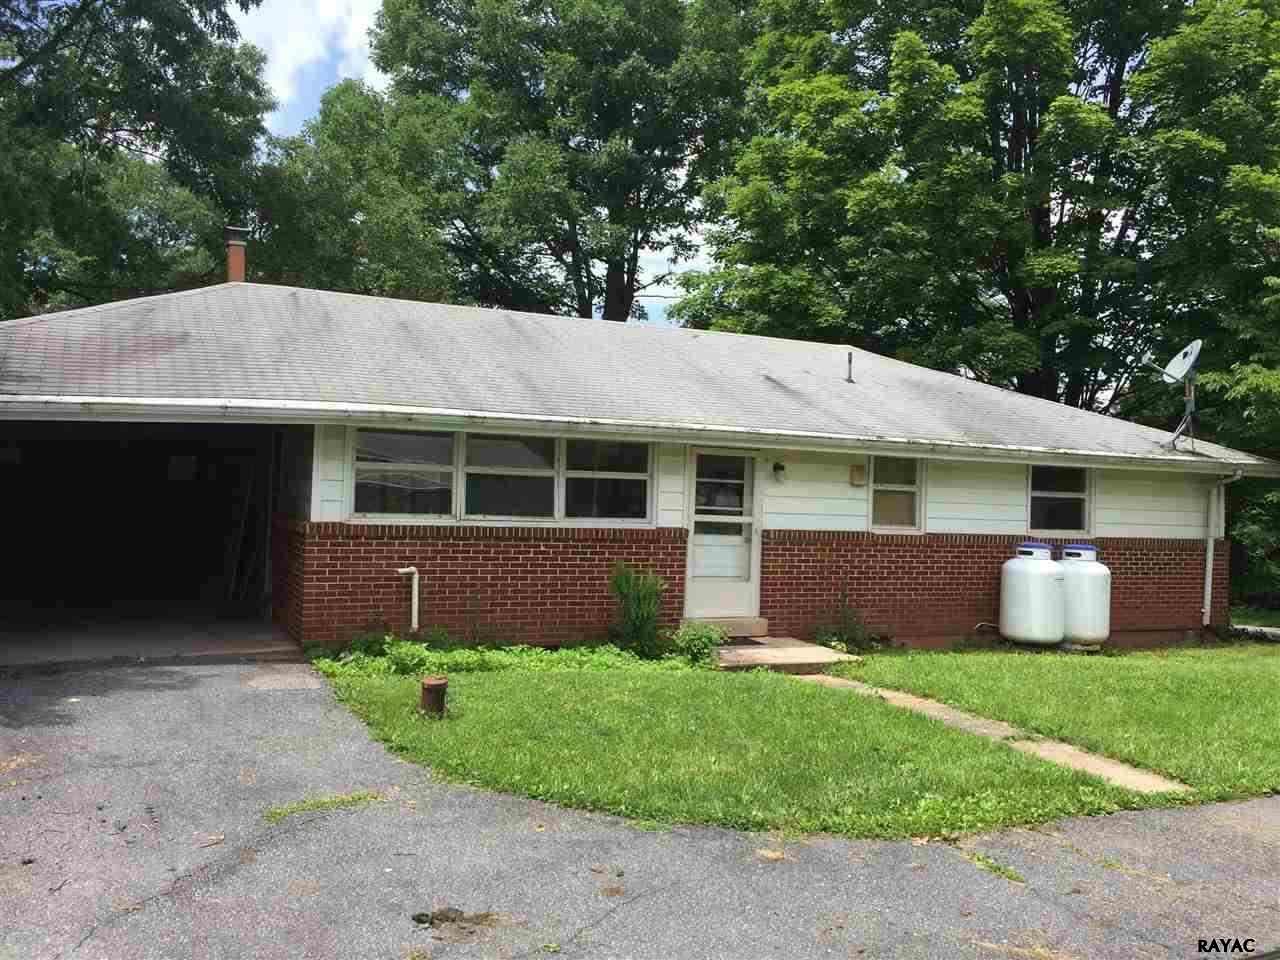 652 Beinhower Rd, Etters, PA 17319